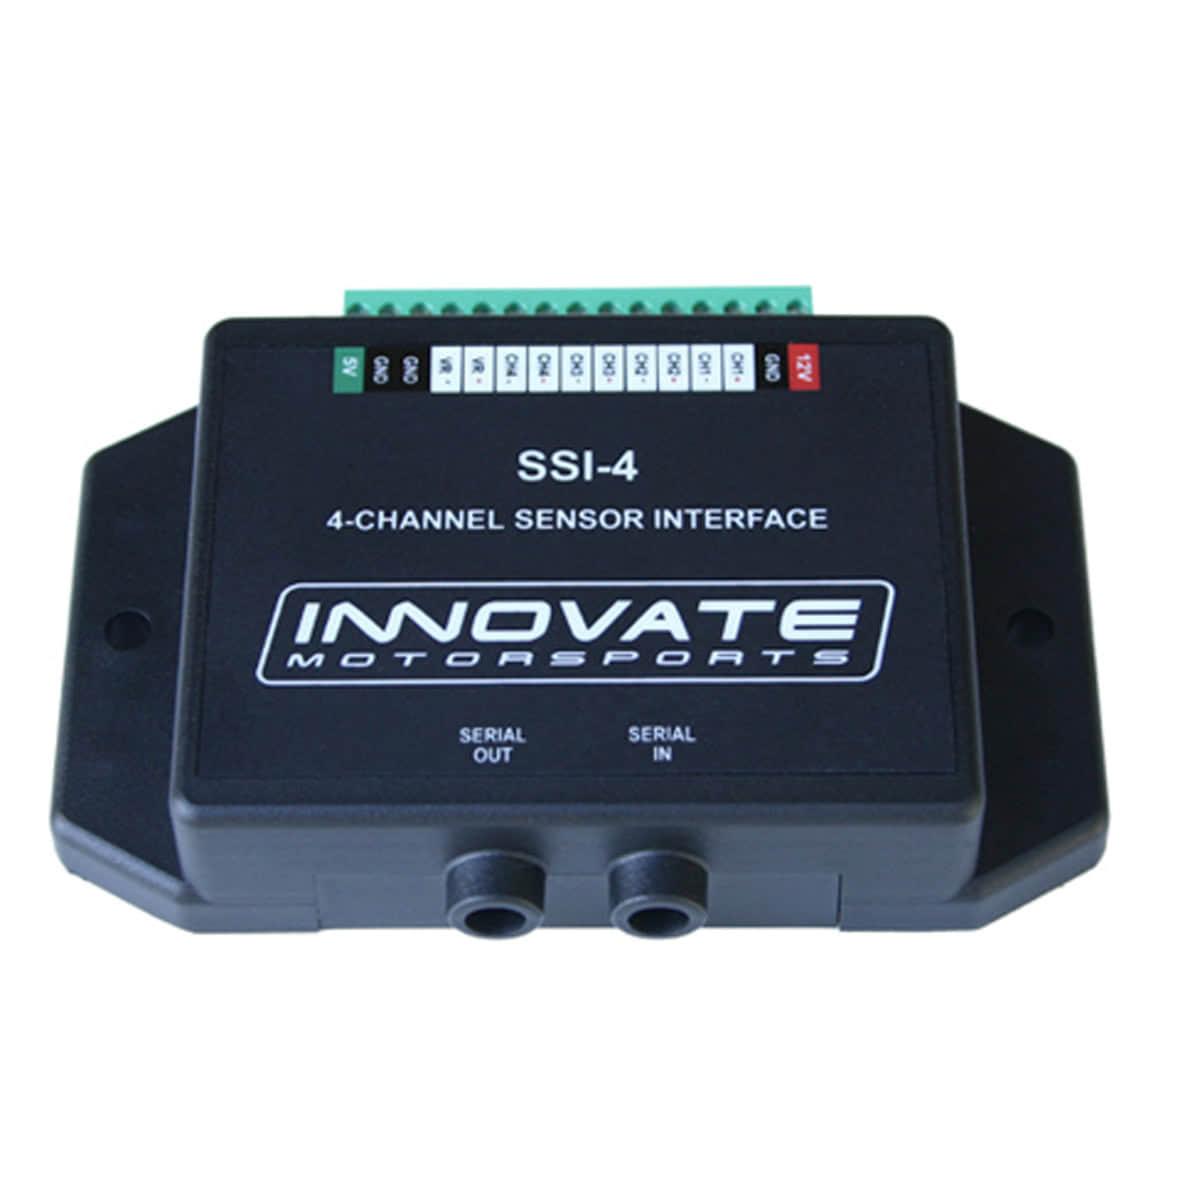 Innovate Motorsports Oil Pressure Gauge Wiring Diagram Electrical Ssi 4 Simple Sensor Interface System 3783 Sunpro Installation